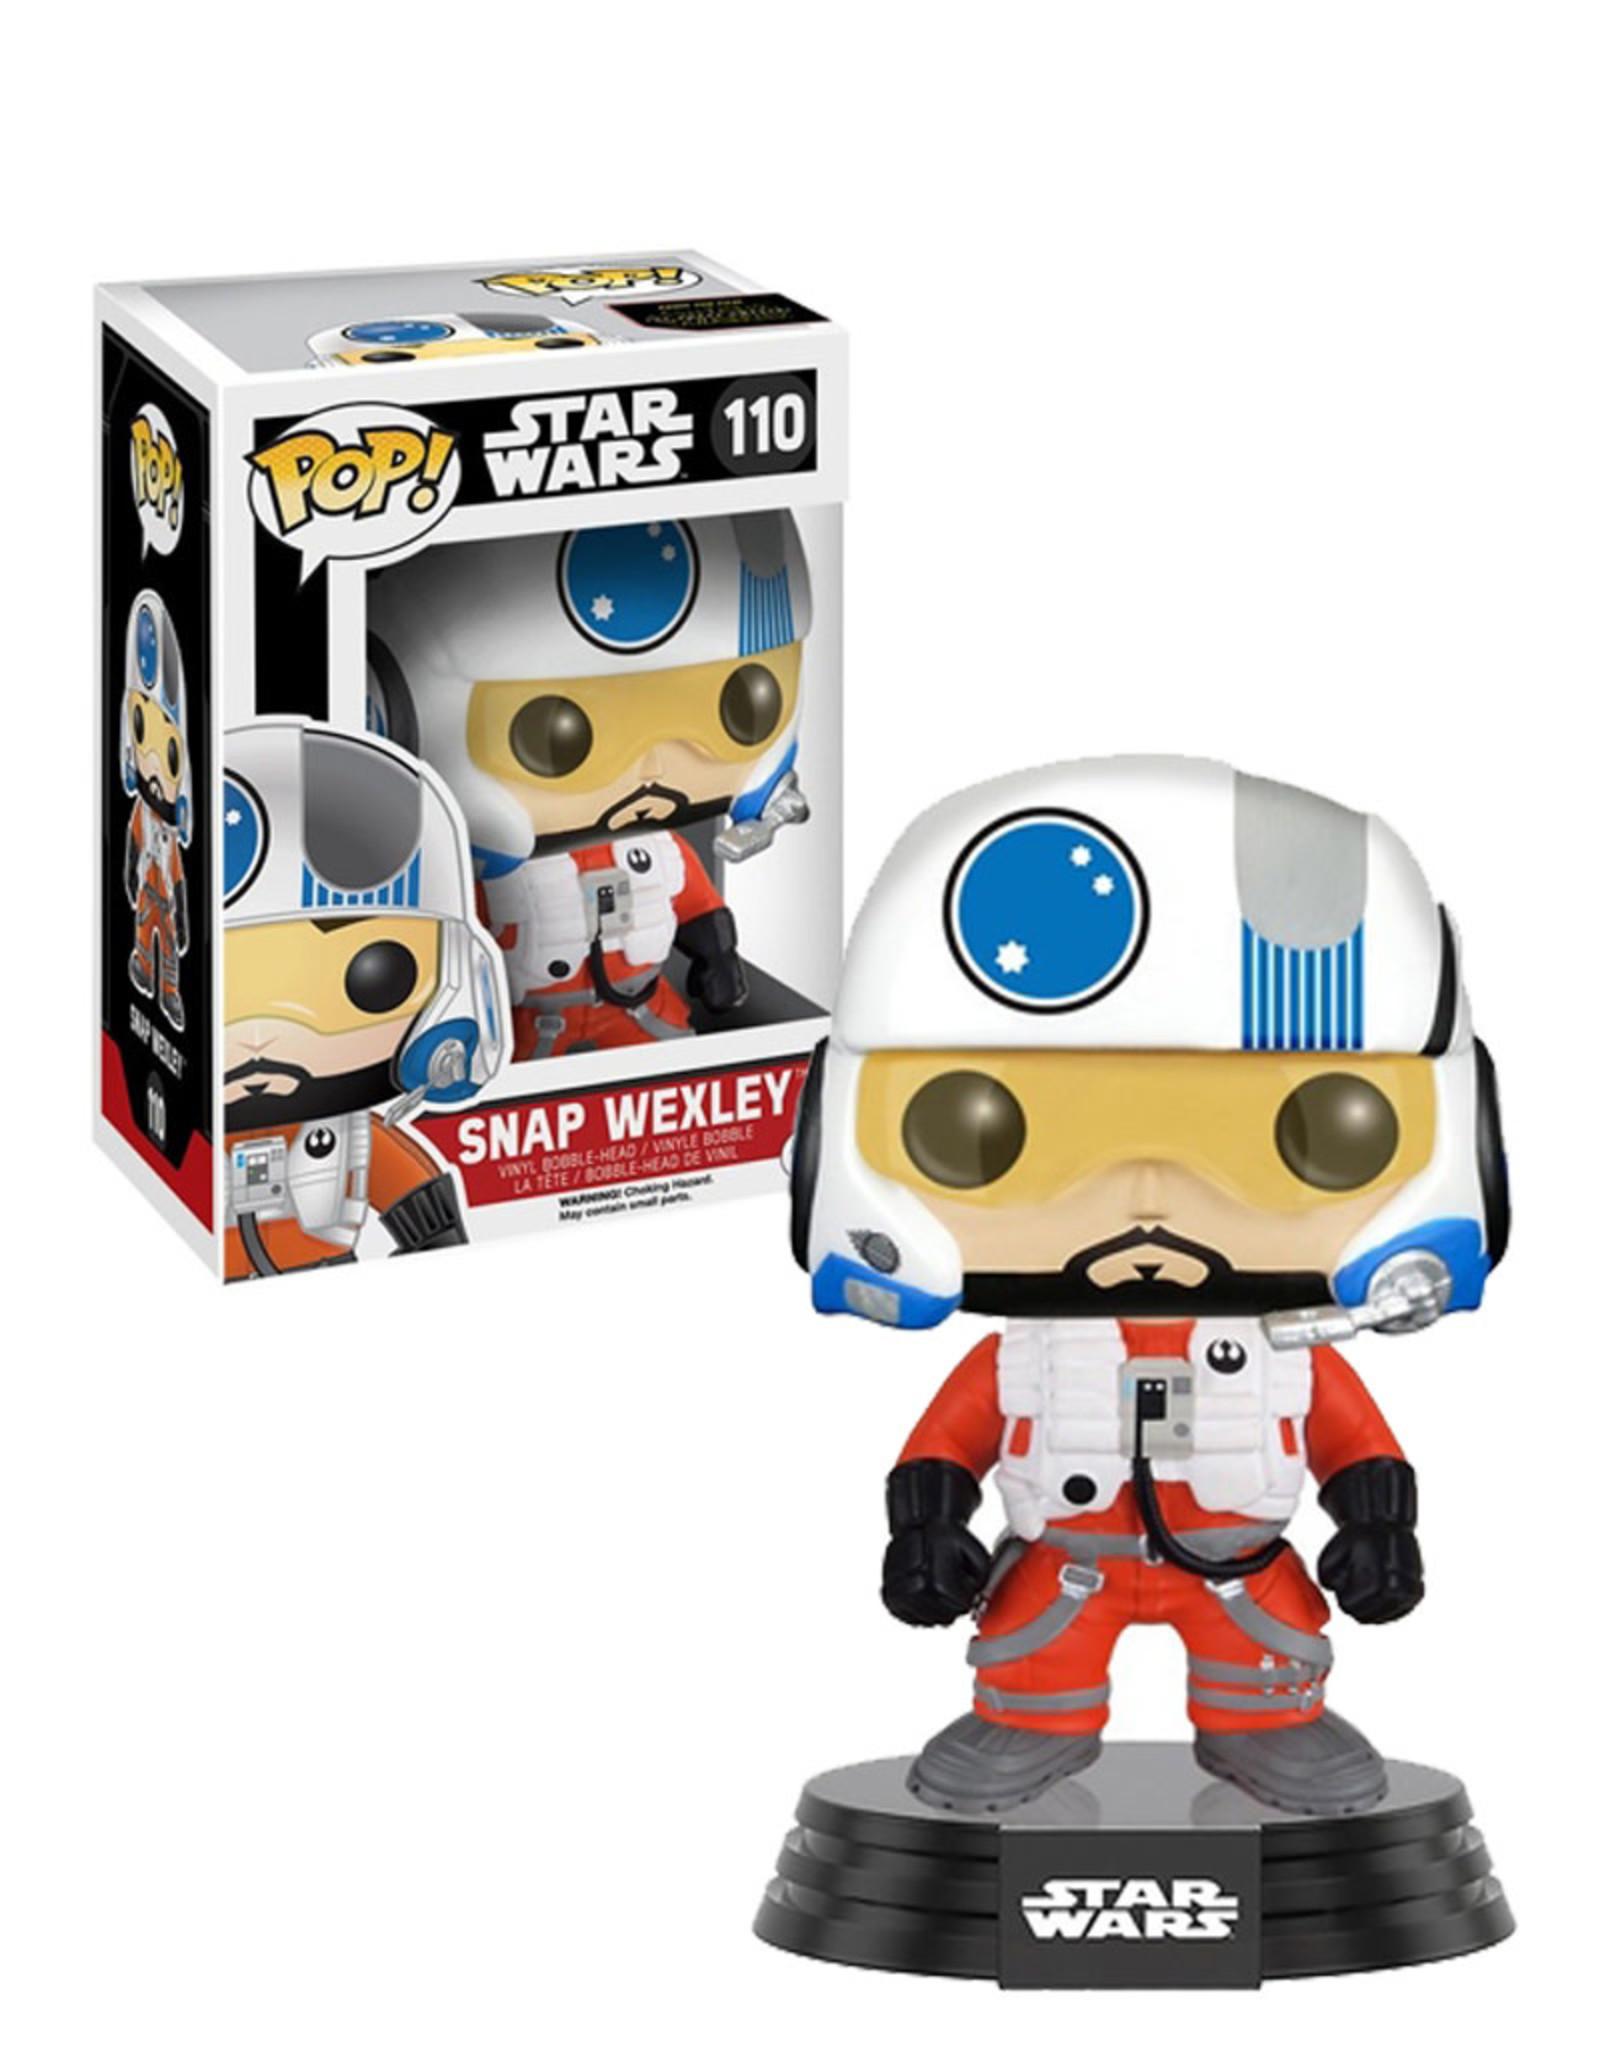 Star Wars Star Wars 110 ( Funko Pop ) Snap Wexley